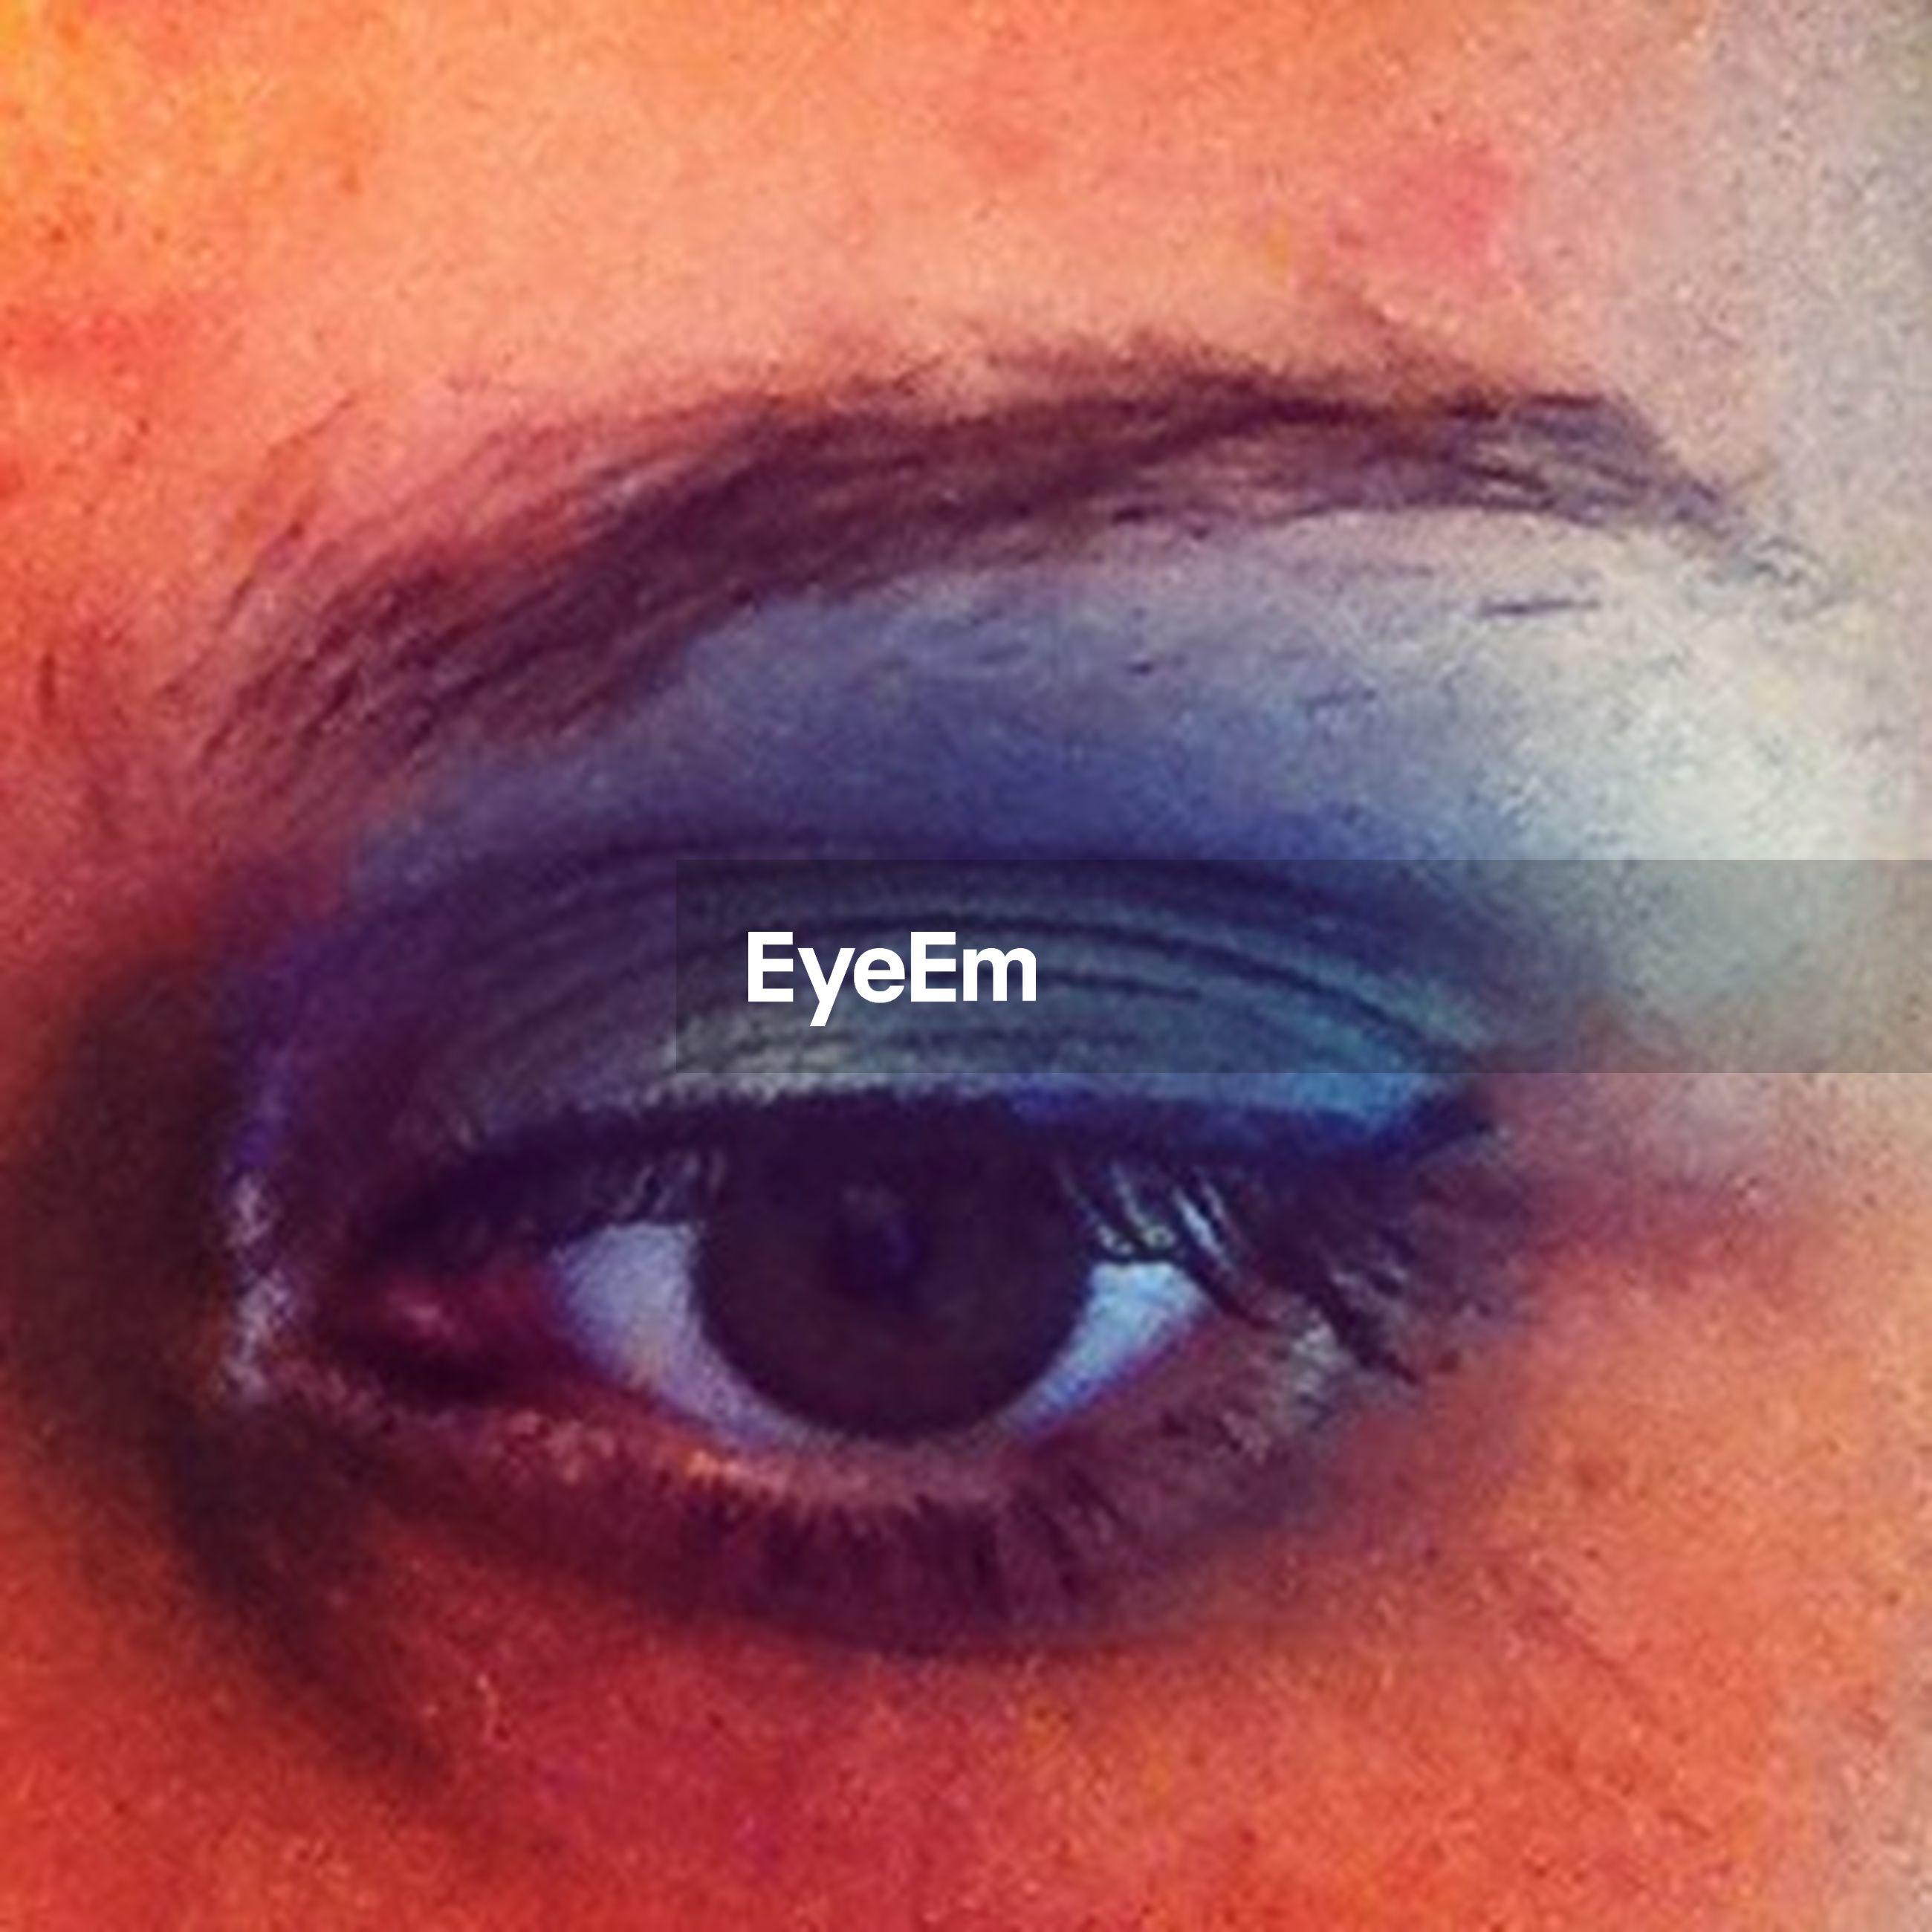 human eye, close-up, eyelash, eyesight, part of, human face, looking at camera, portrait, headshot, lifestyles, human skin, sensory perception, extreme close-up, eyeball, extreme close up, eyebrow, iris - eye